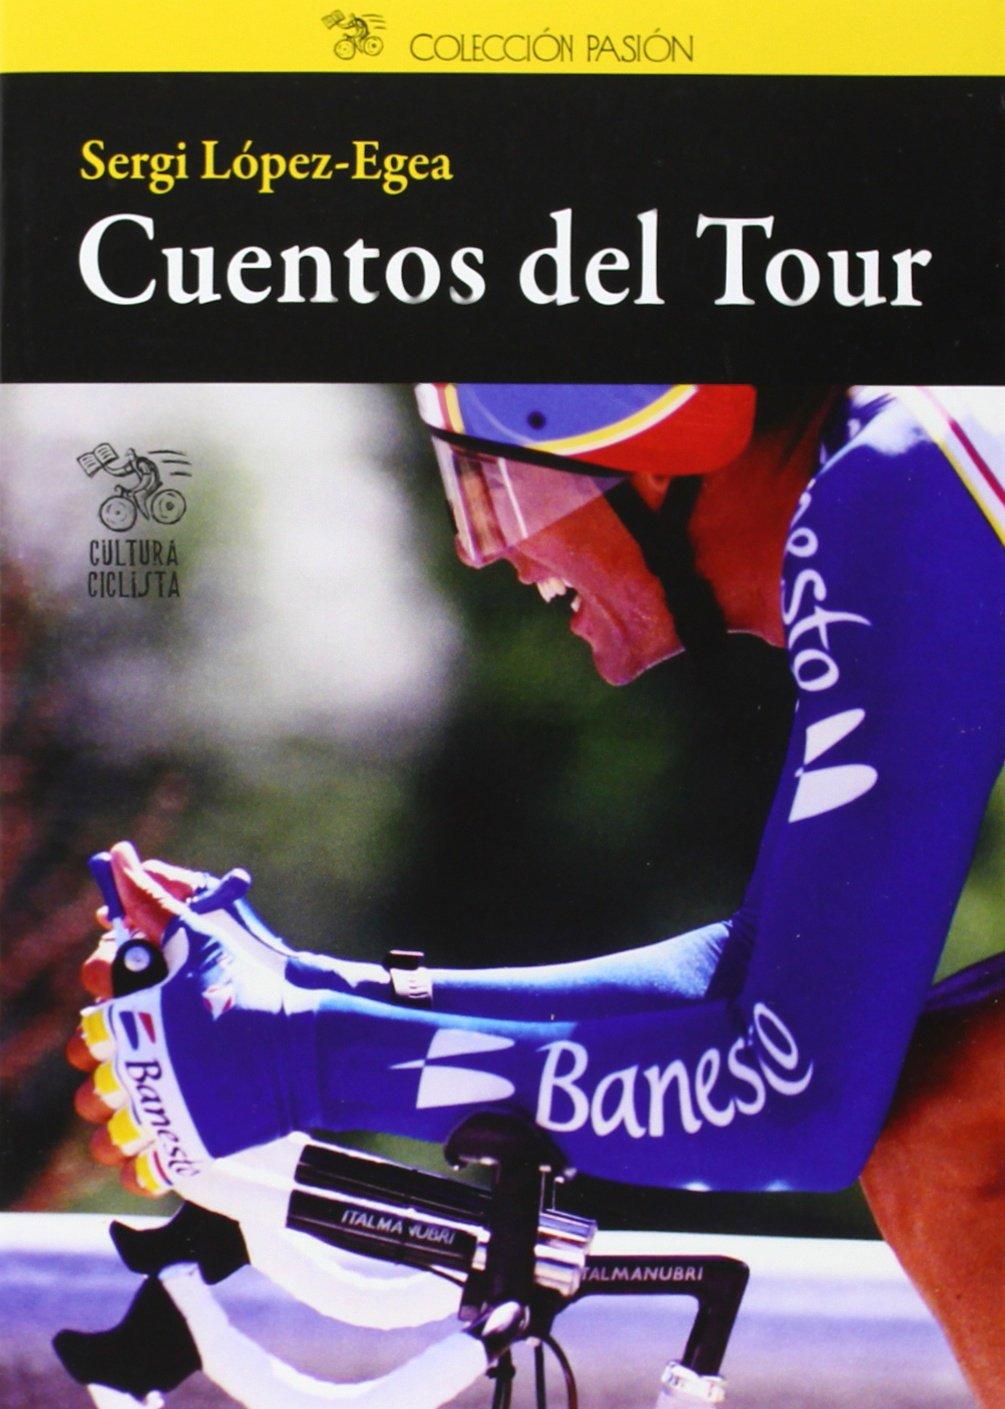 71Nt668VG4L - Libros de Ciclismo